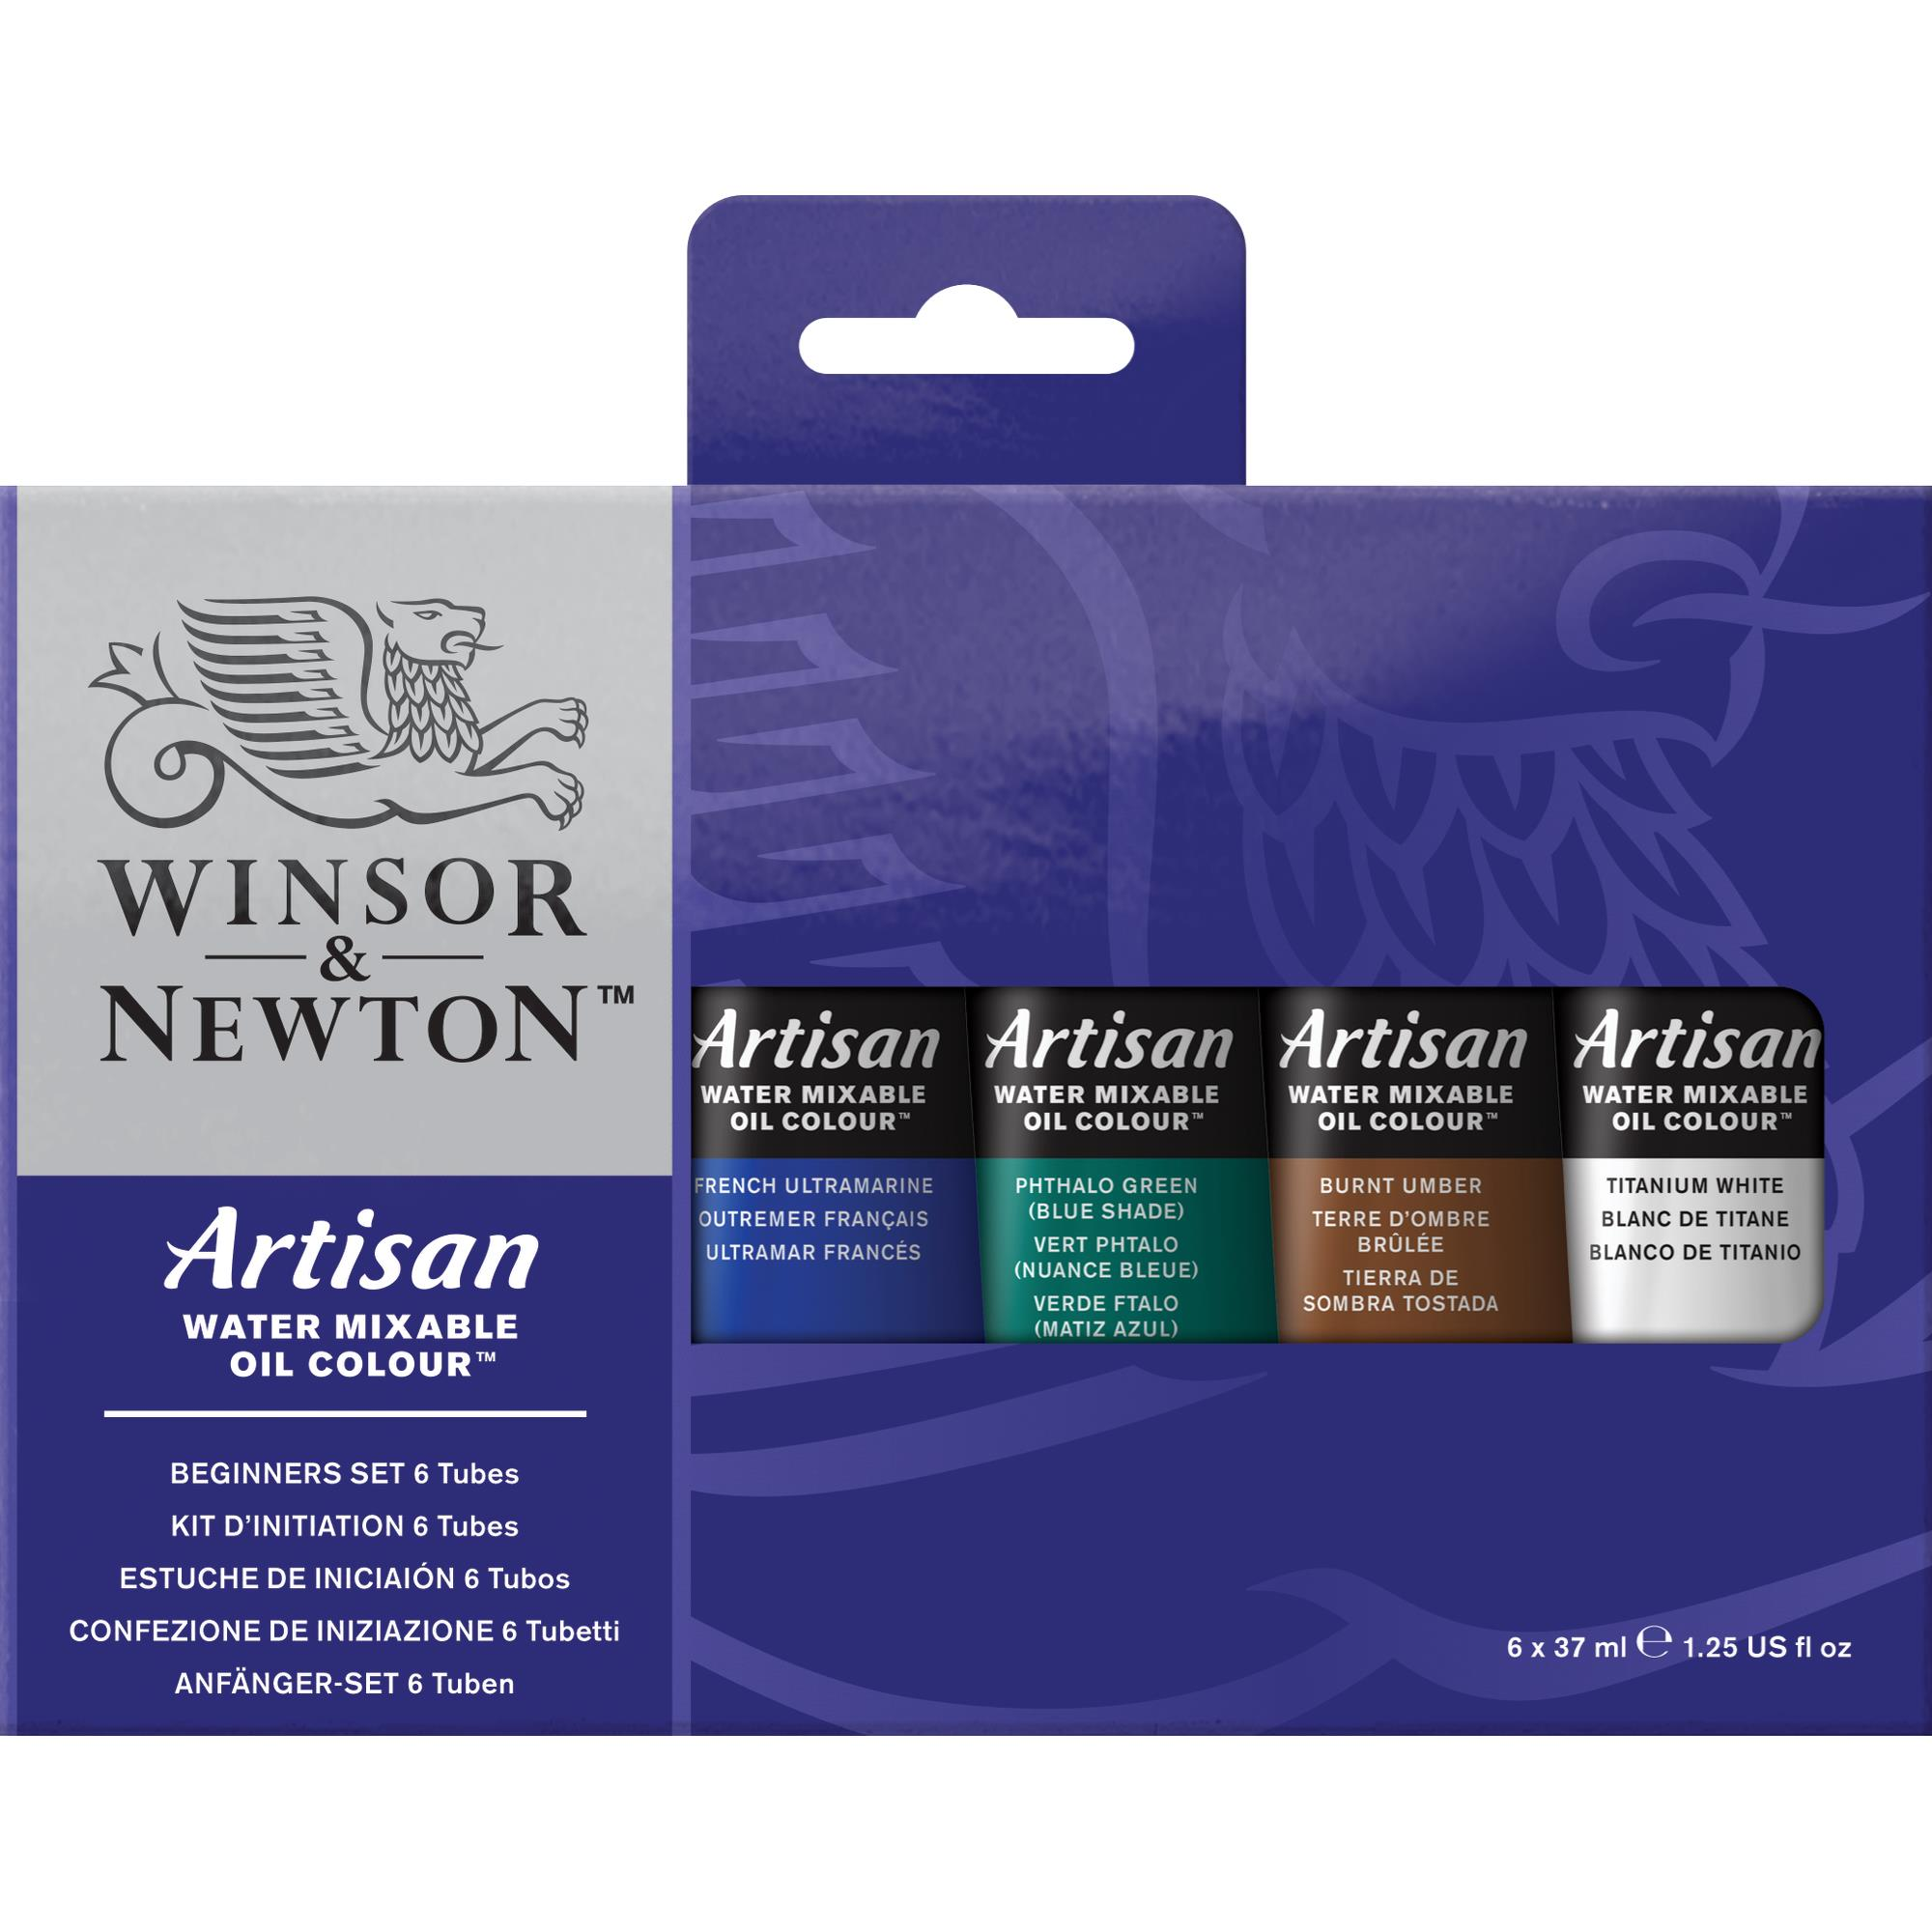 Winsor & Newton Artisan Water Mixable Oil Colour 37ml 6-Tube Beginner Set